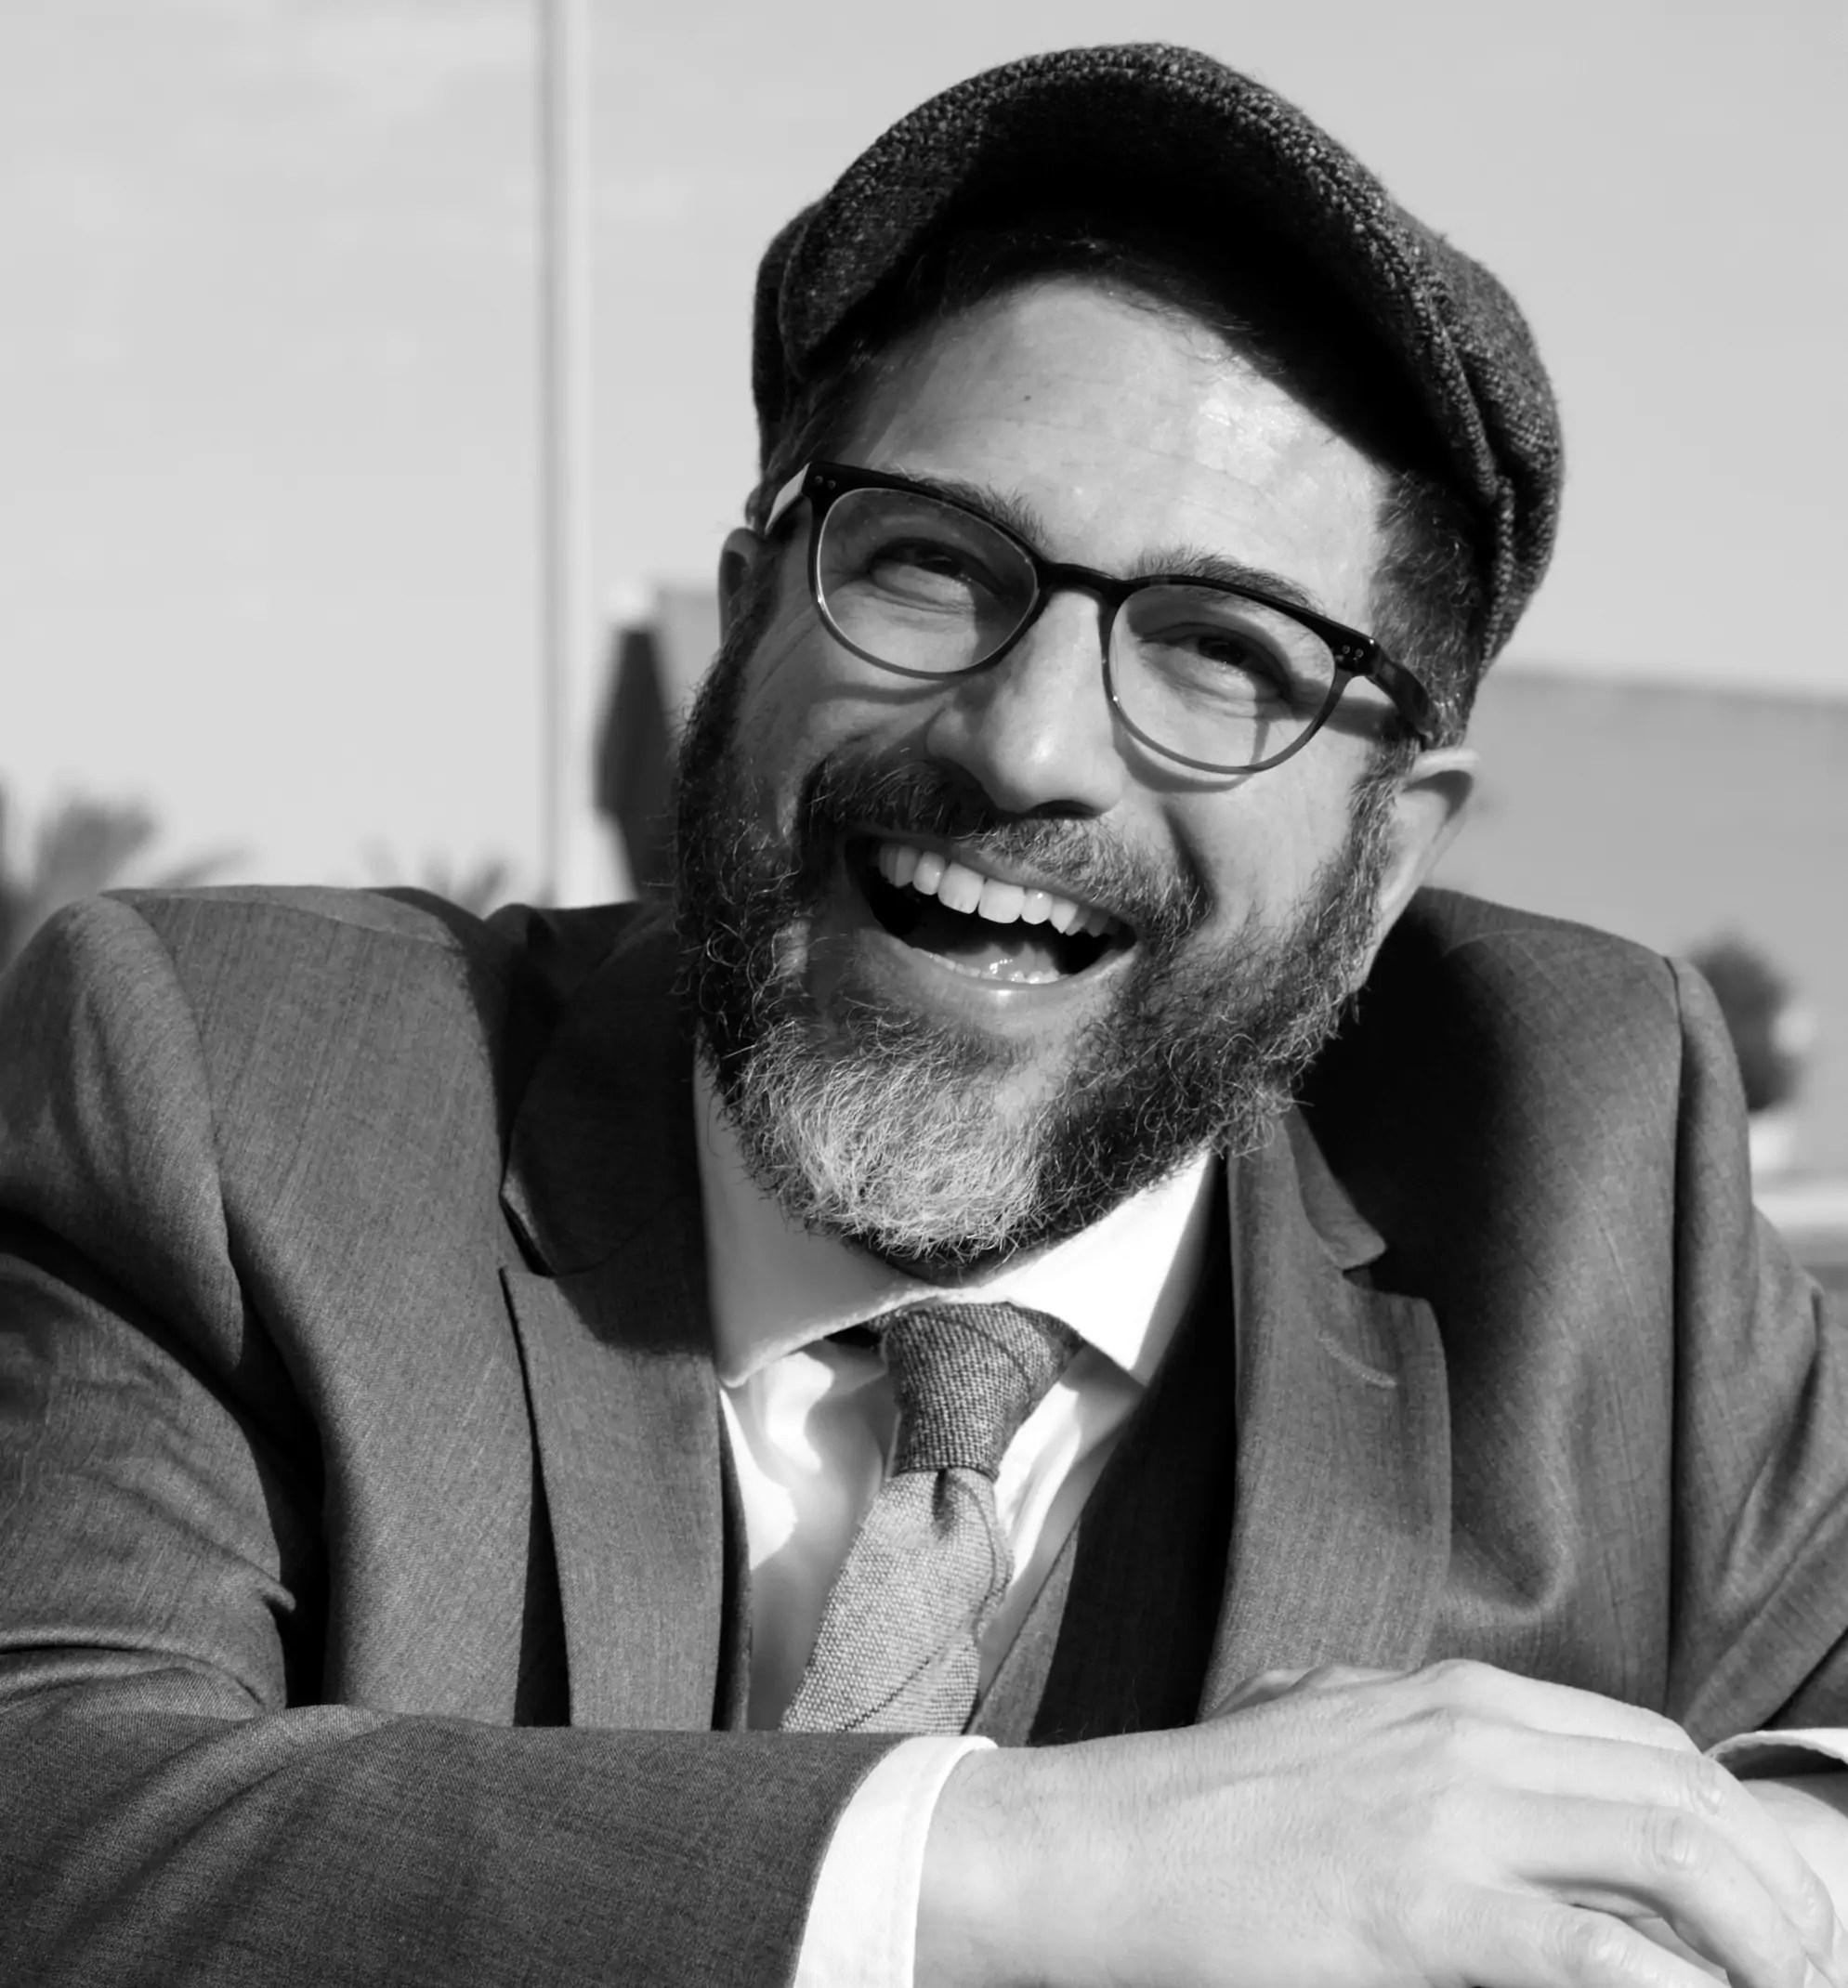 Rabbi Shimshon Meir Frankel